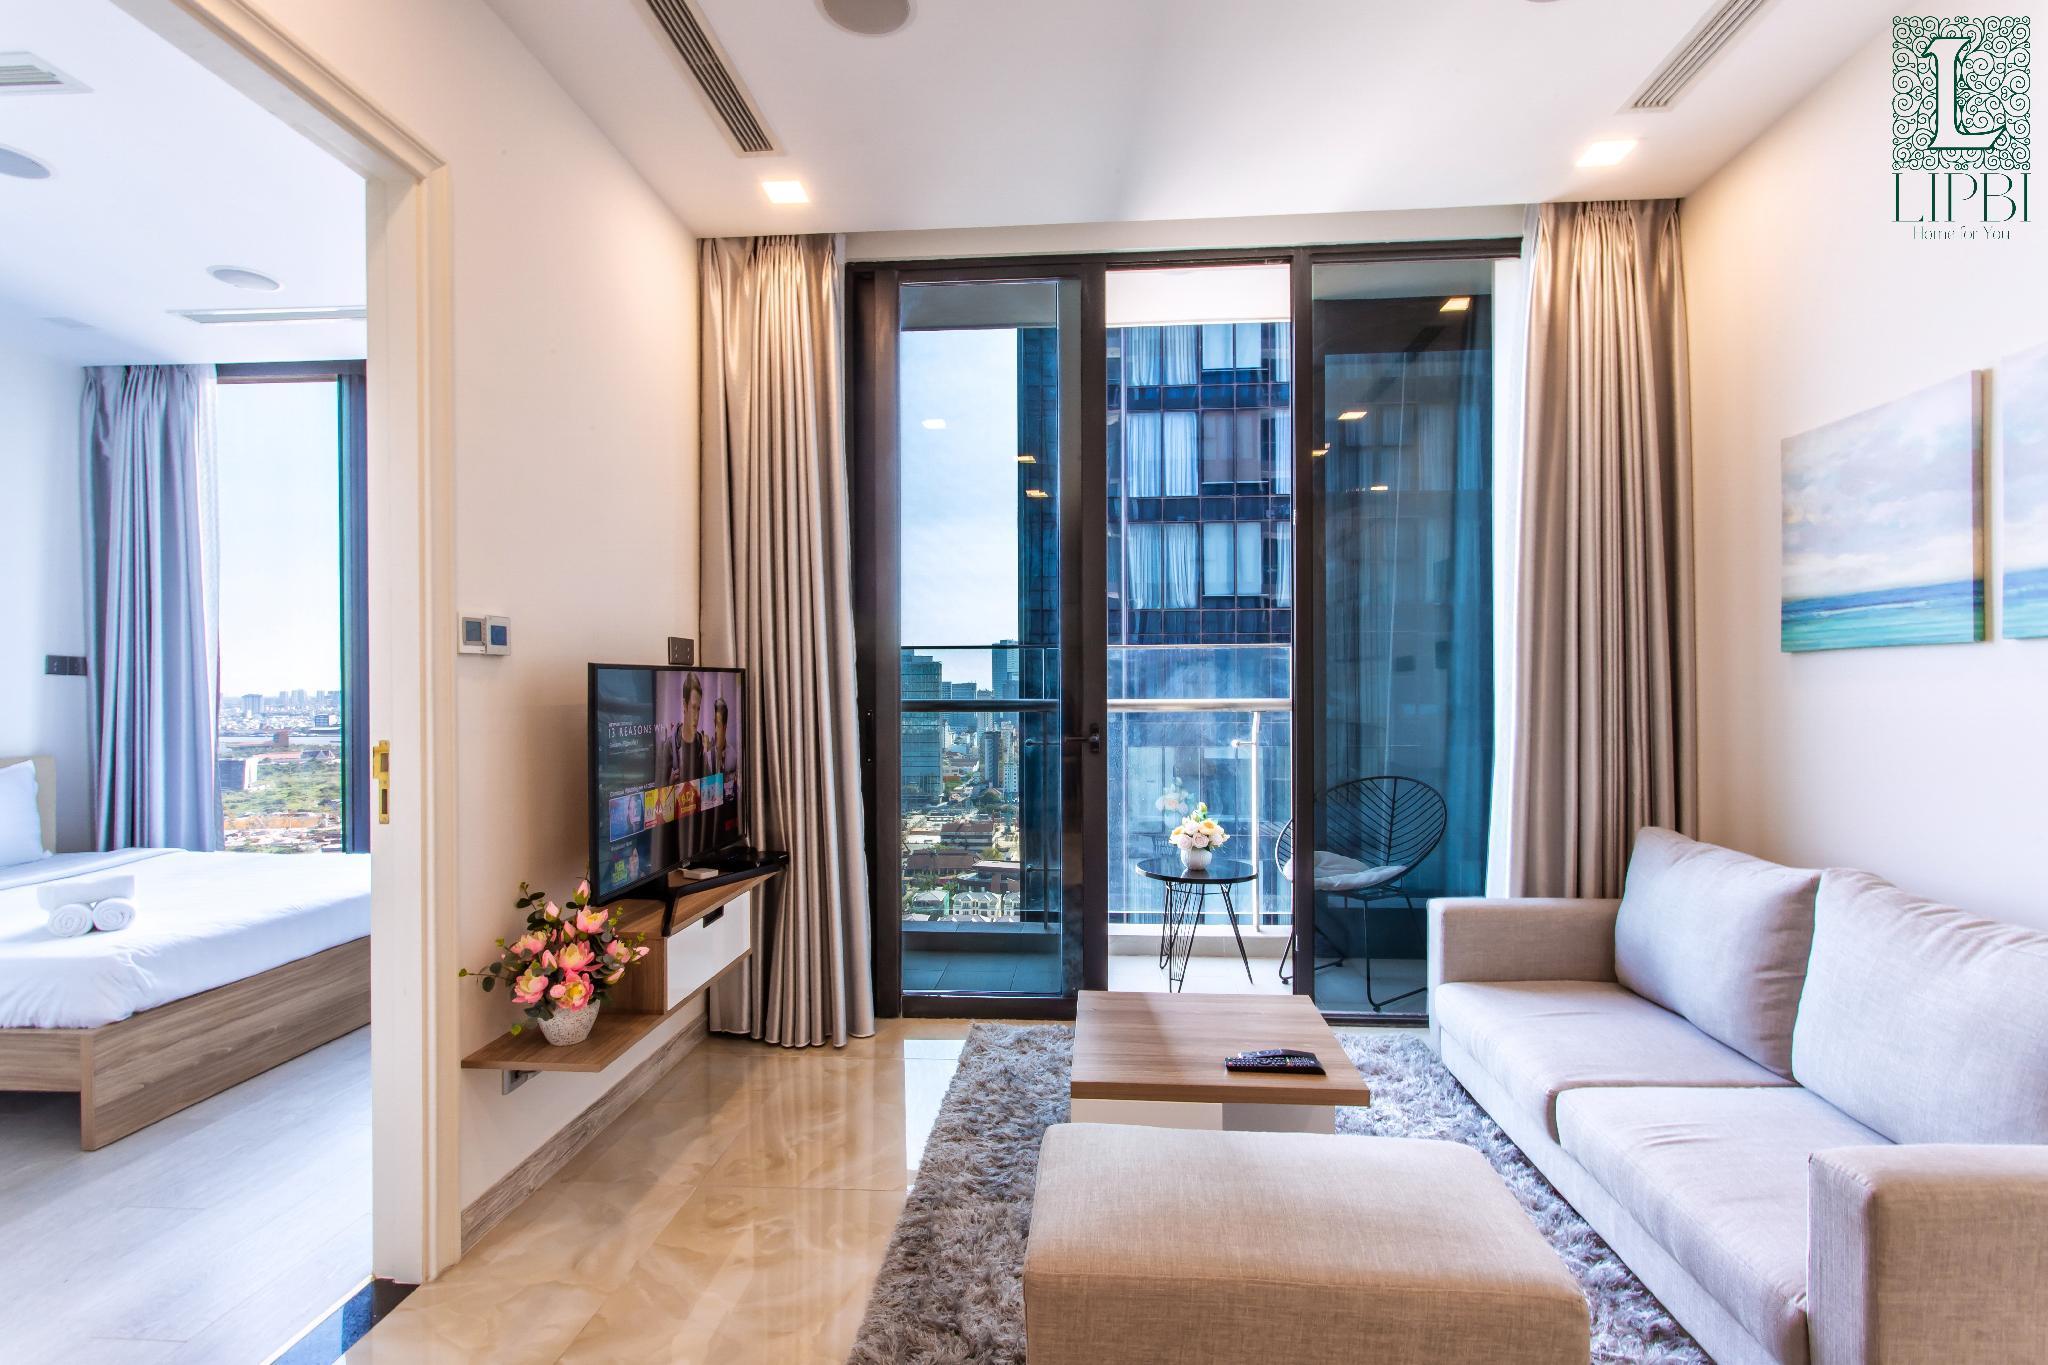 Lipbi Home  FREE PICKUP Central Luxury Condo